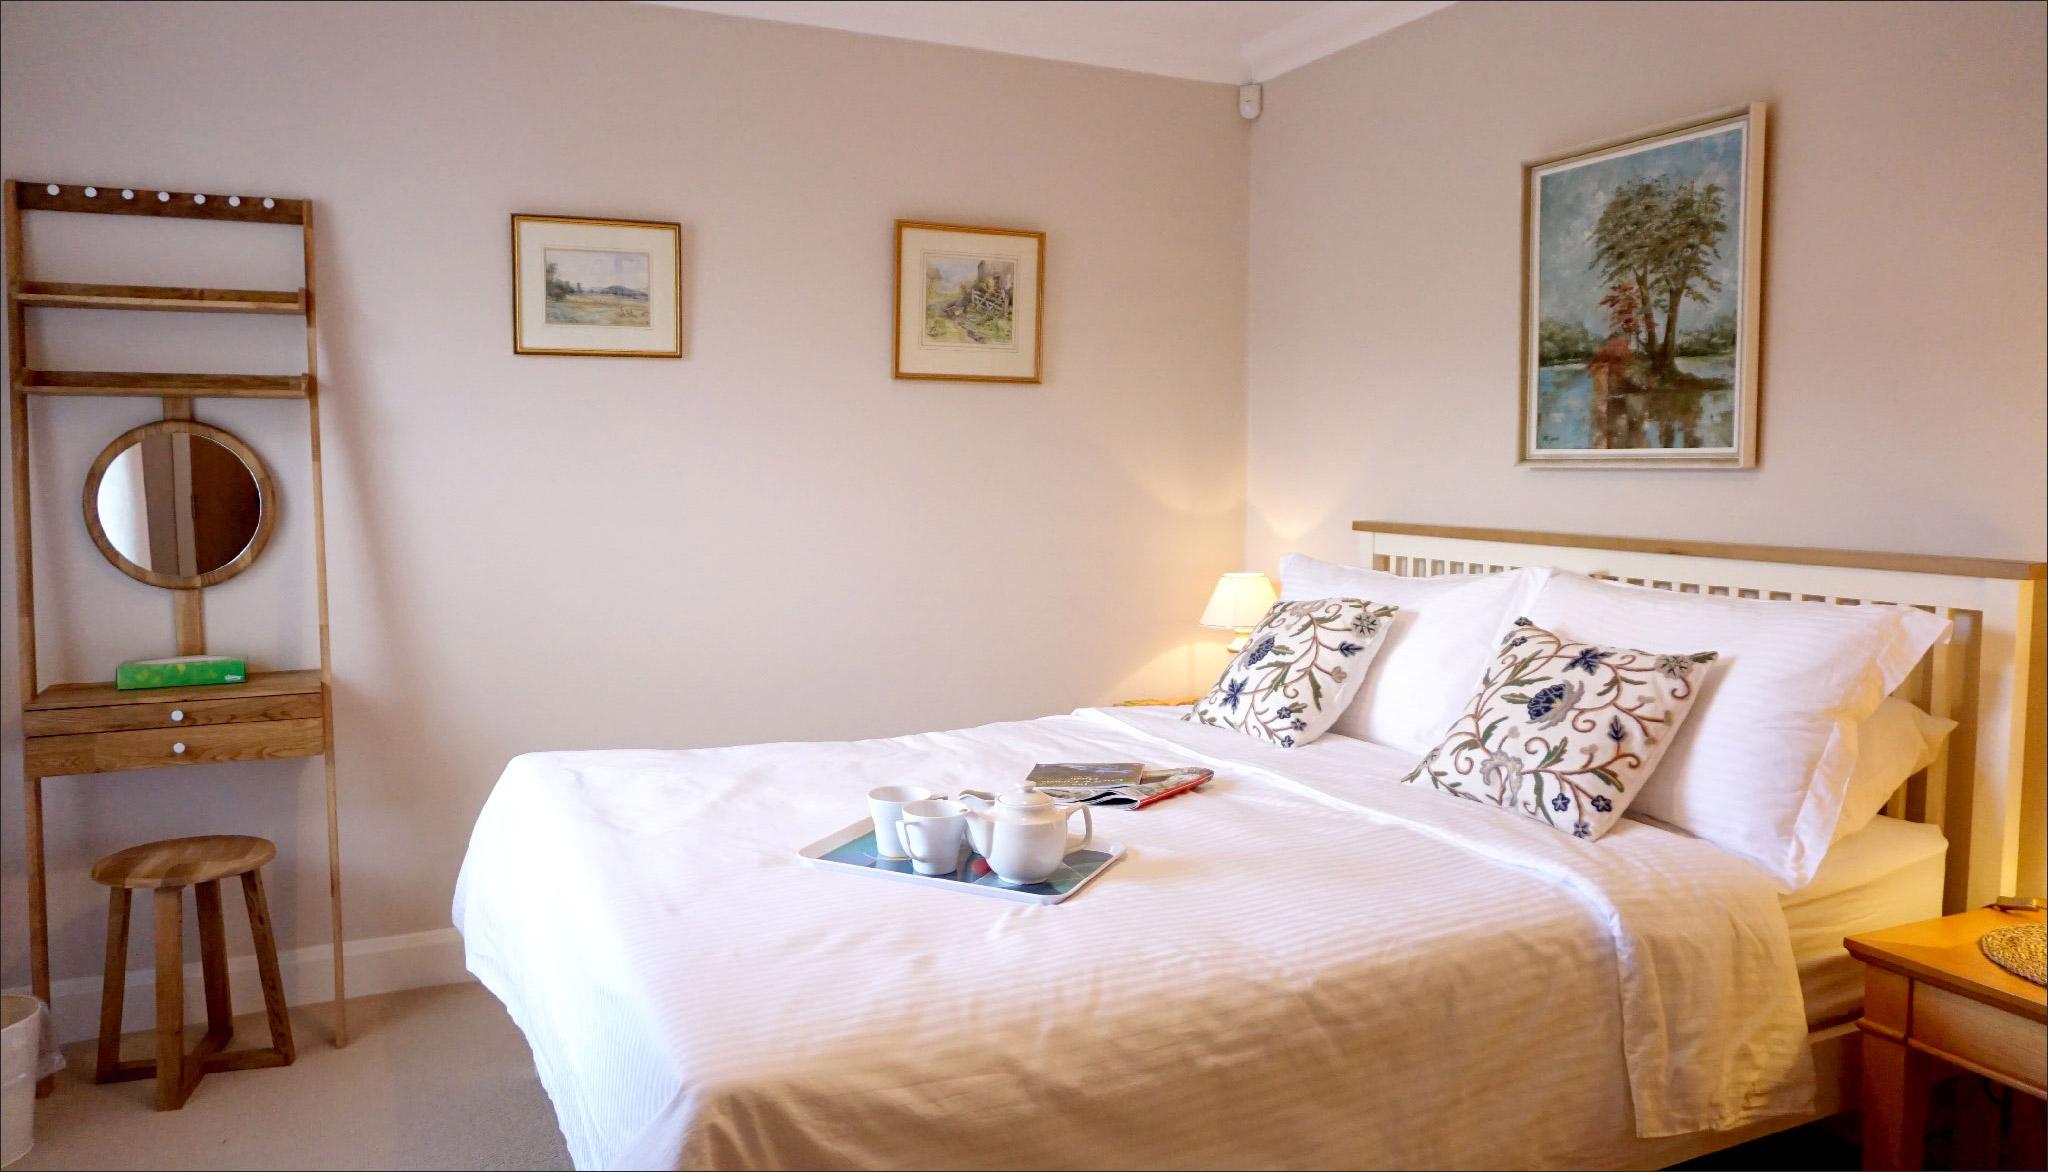 The_Hoolet_Crieff-Bedroom_1-1.jpg